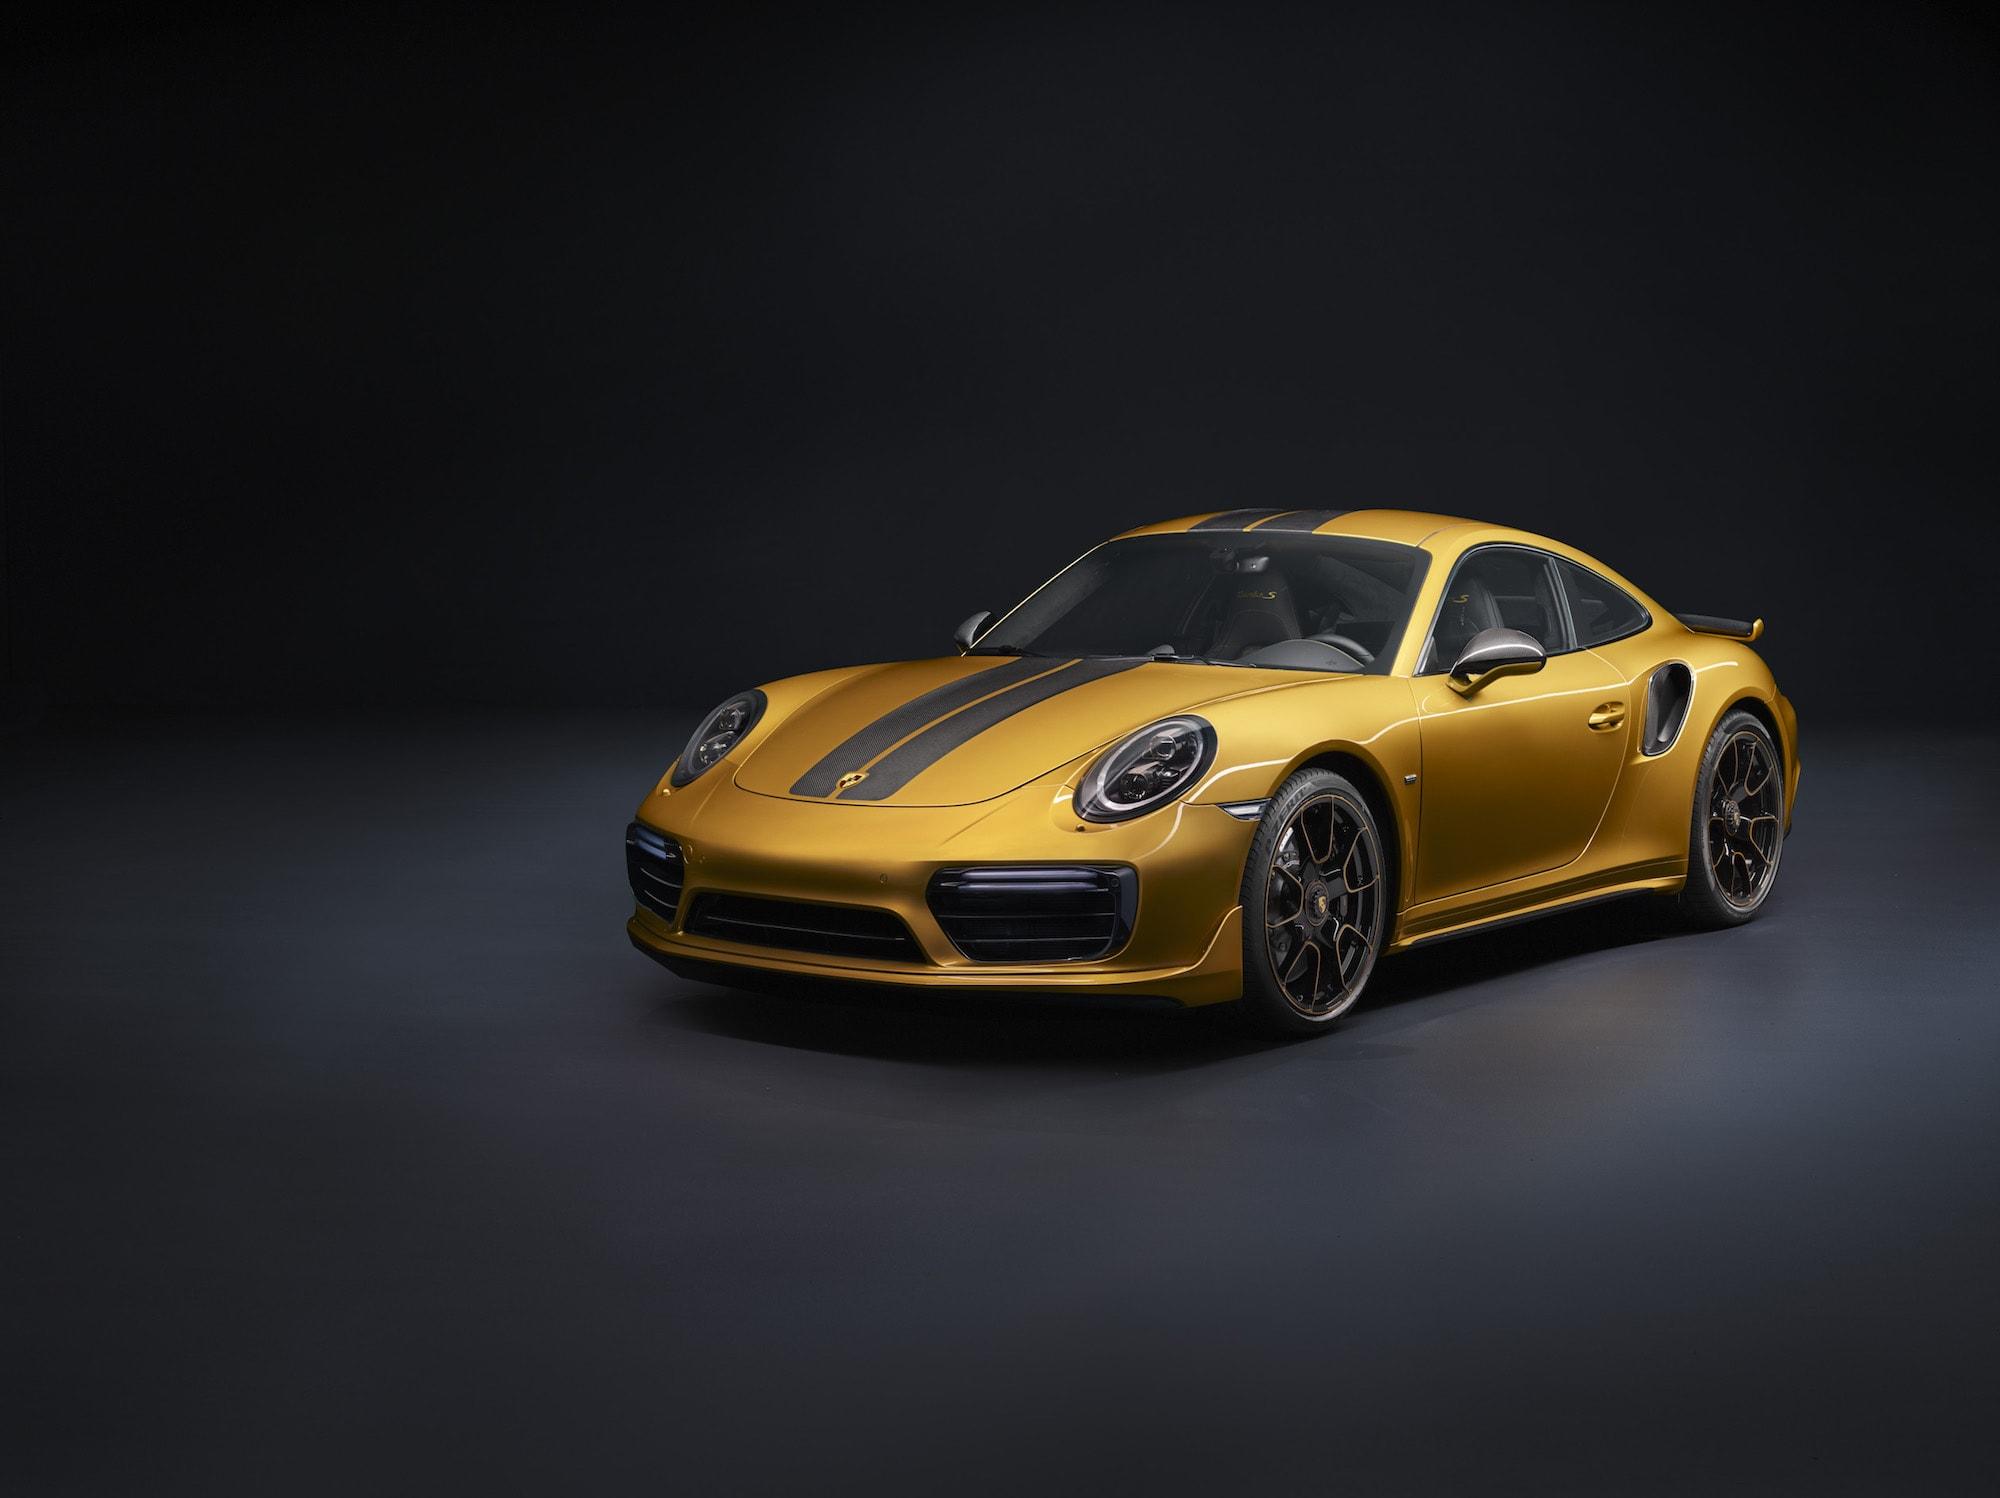 Echt goldig: Der Neue 911 Turbo S Exclusive Series 1